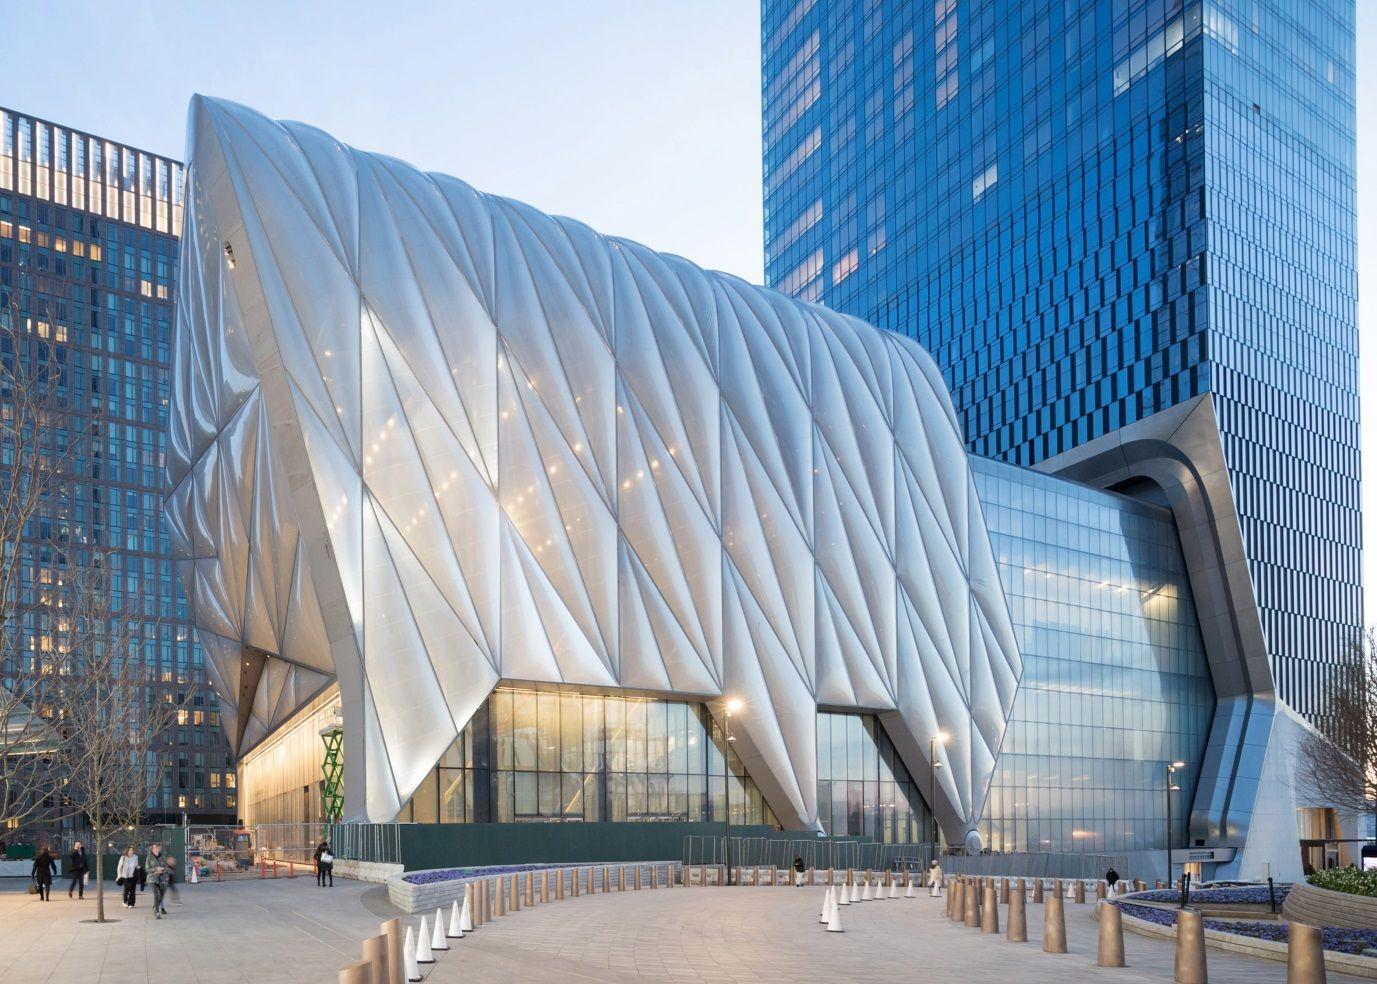 Арт-центр The Shed в Нью-Йорку